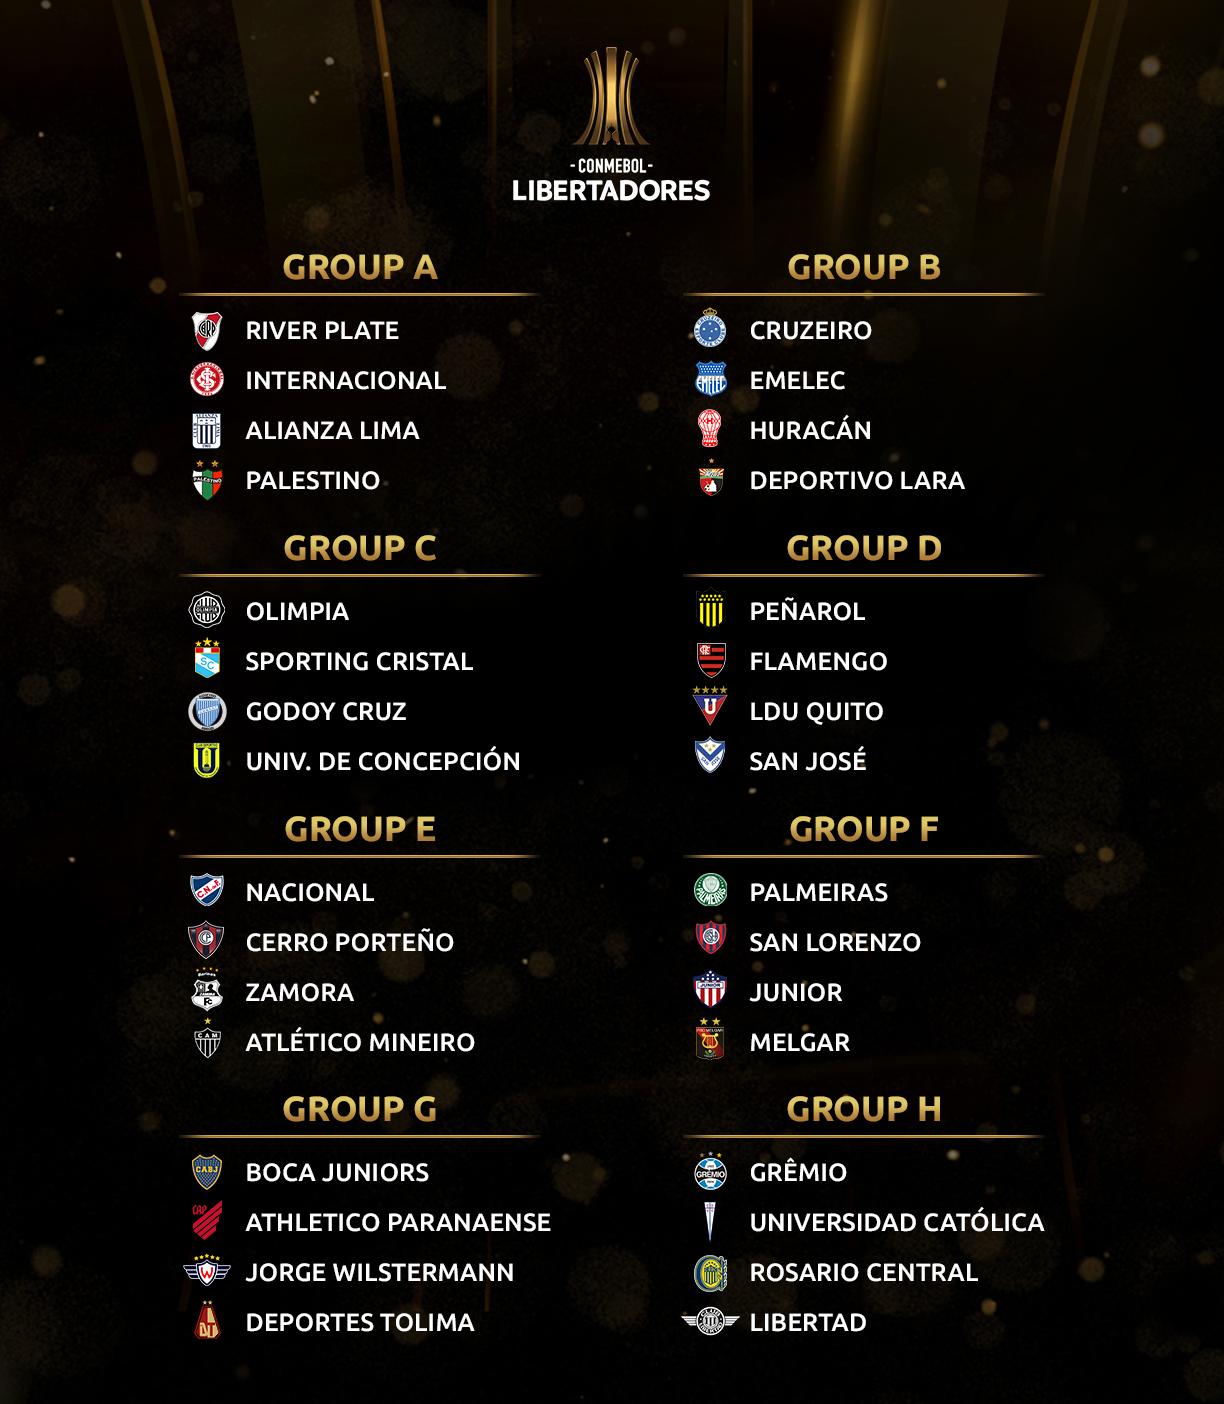 Libertadores Groups